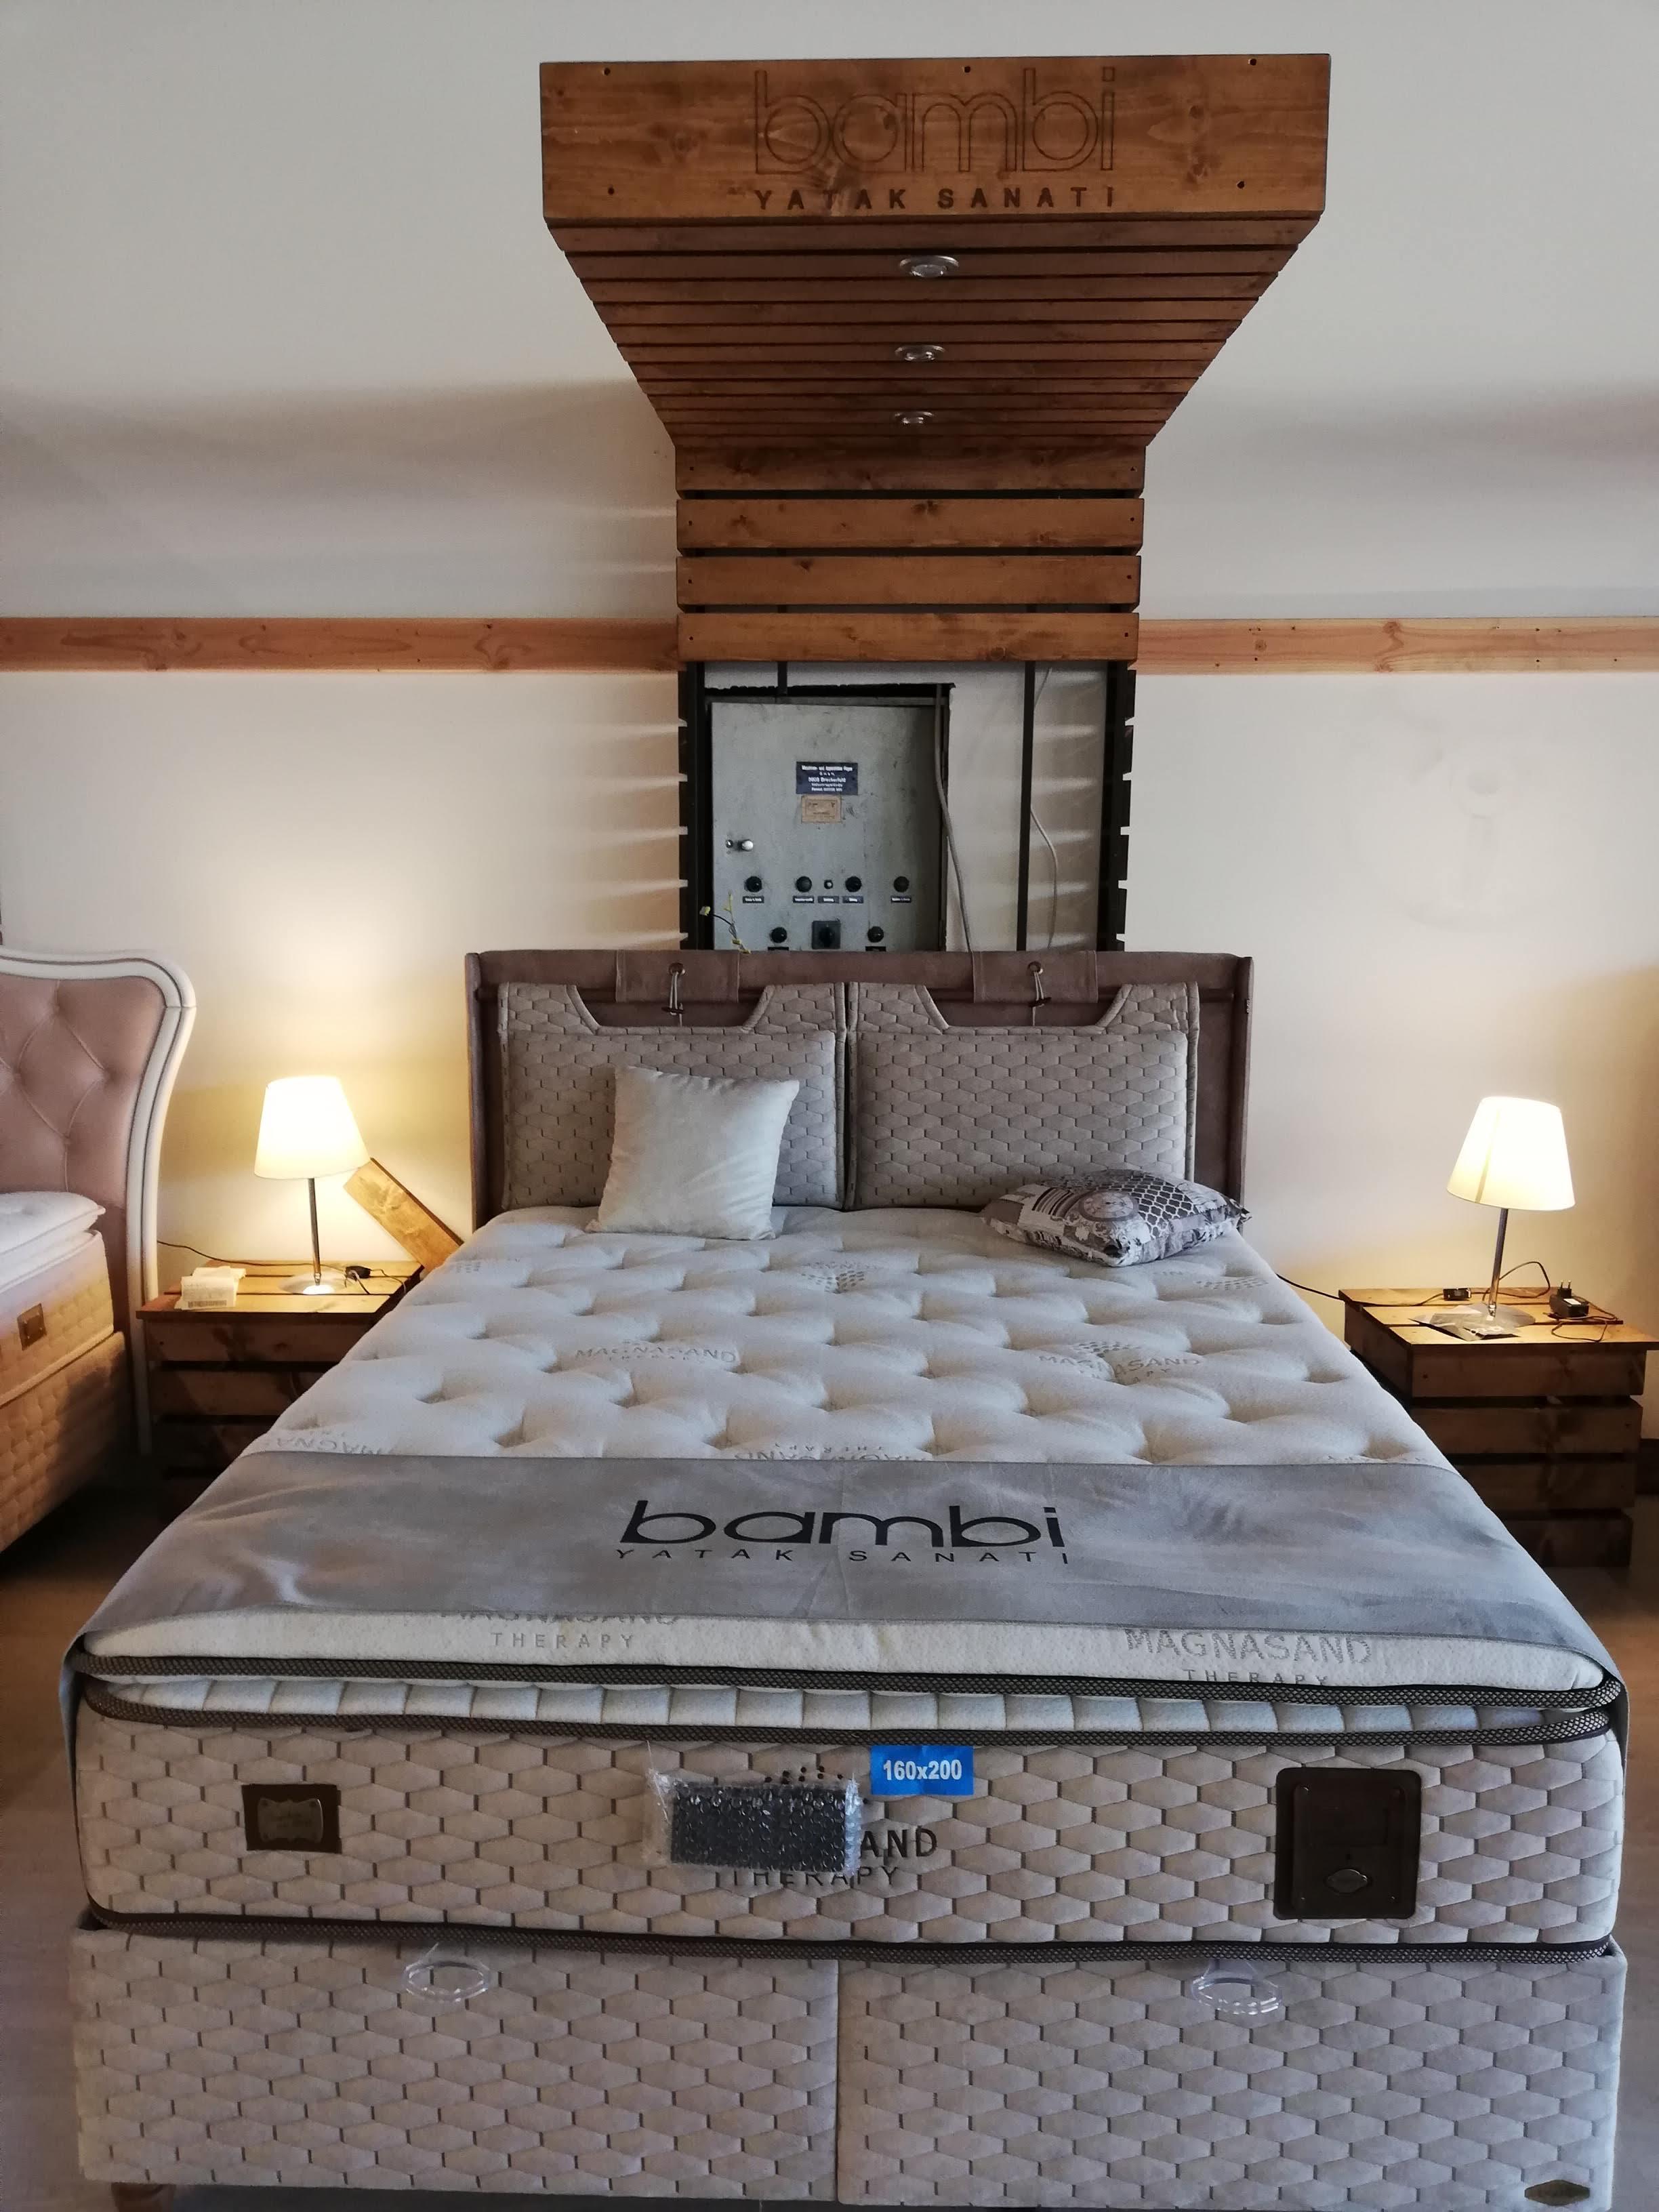 BAMBI-Betten - Premium-Betten inkl. Taschenfederkern-Matratzen